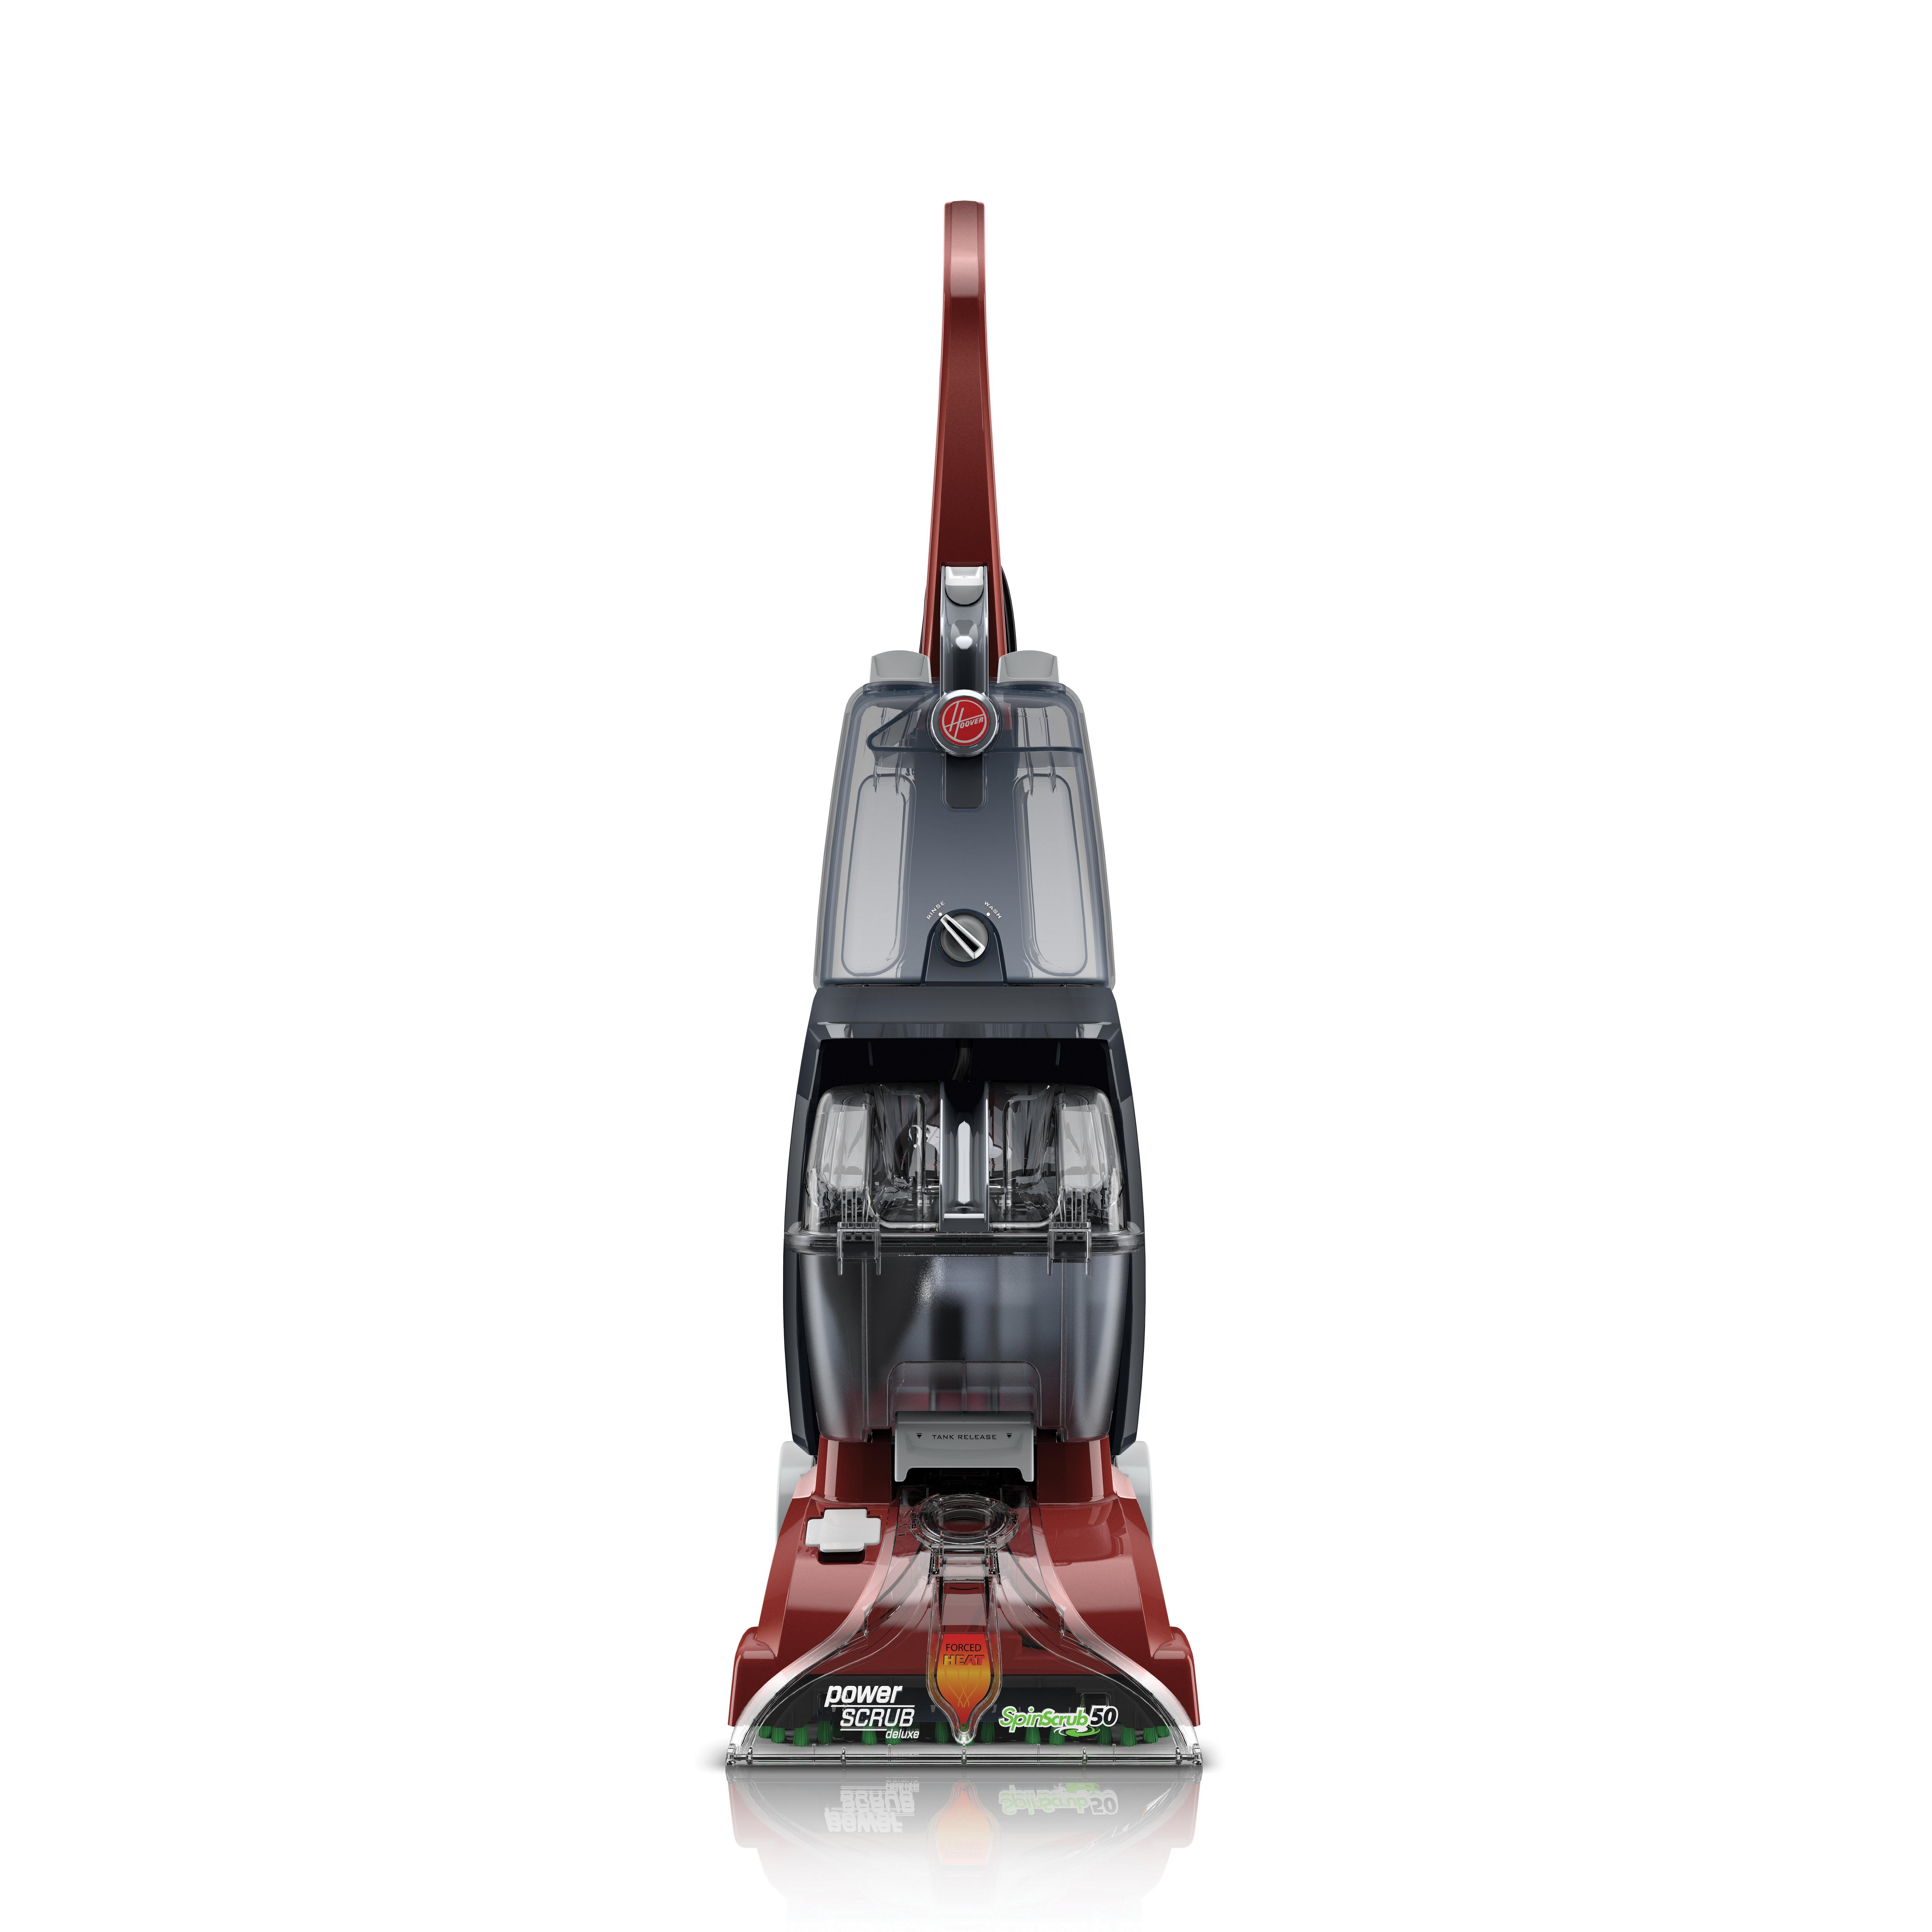 Power Scrub Deluxe Carpet Cleaner